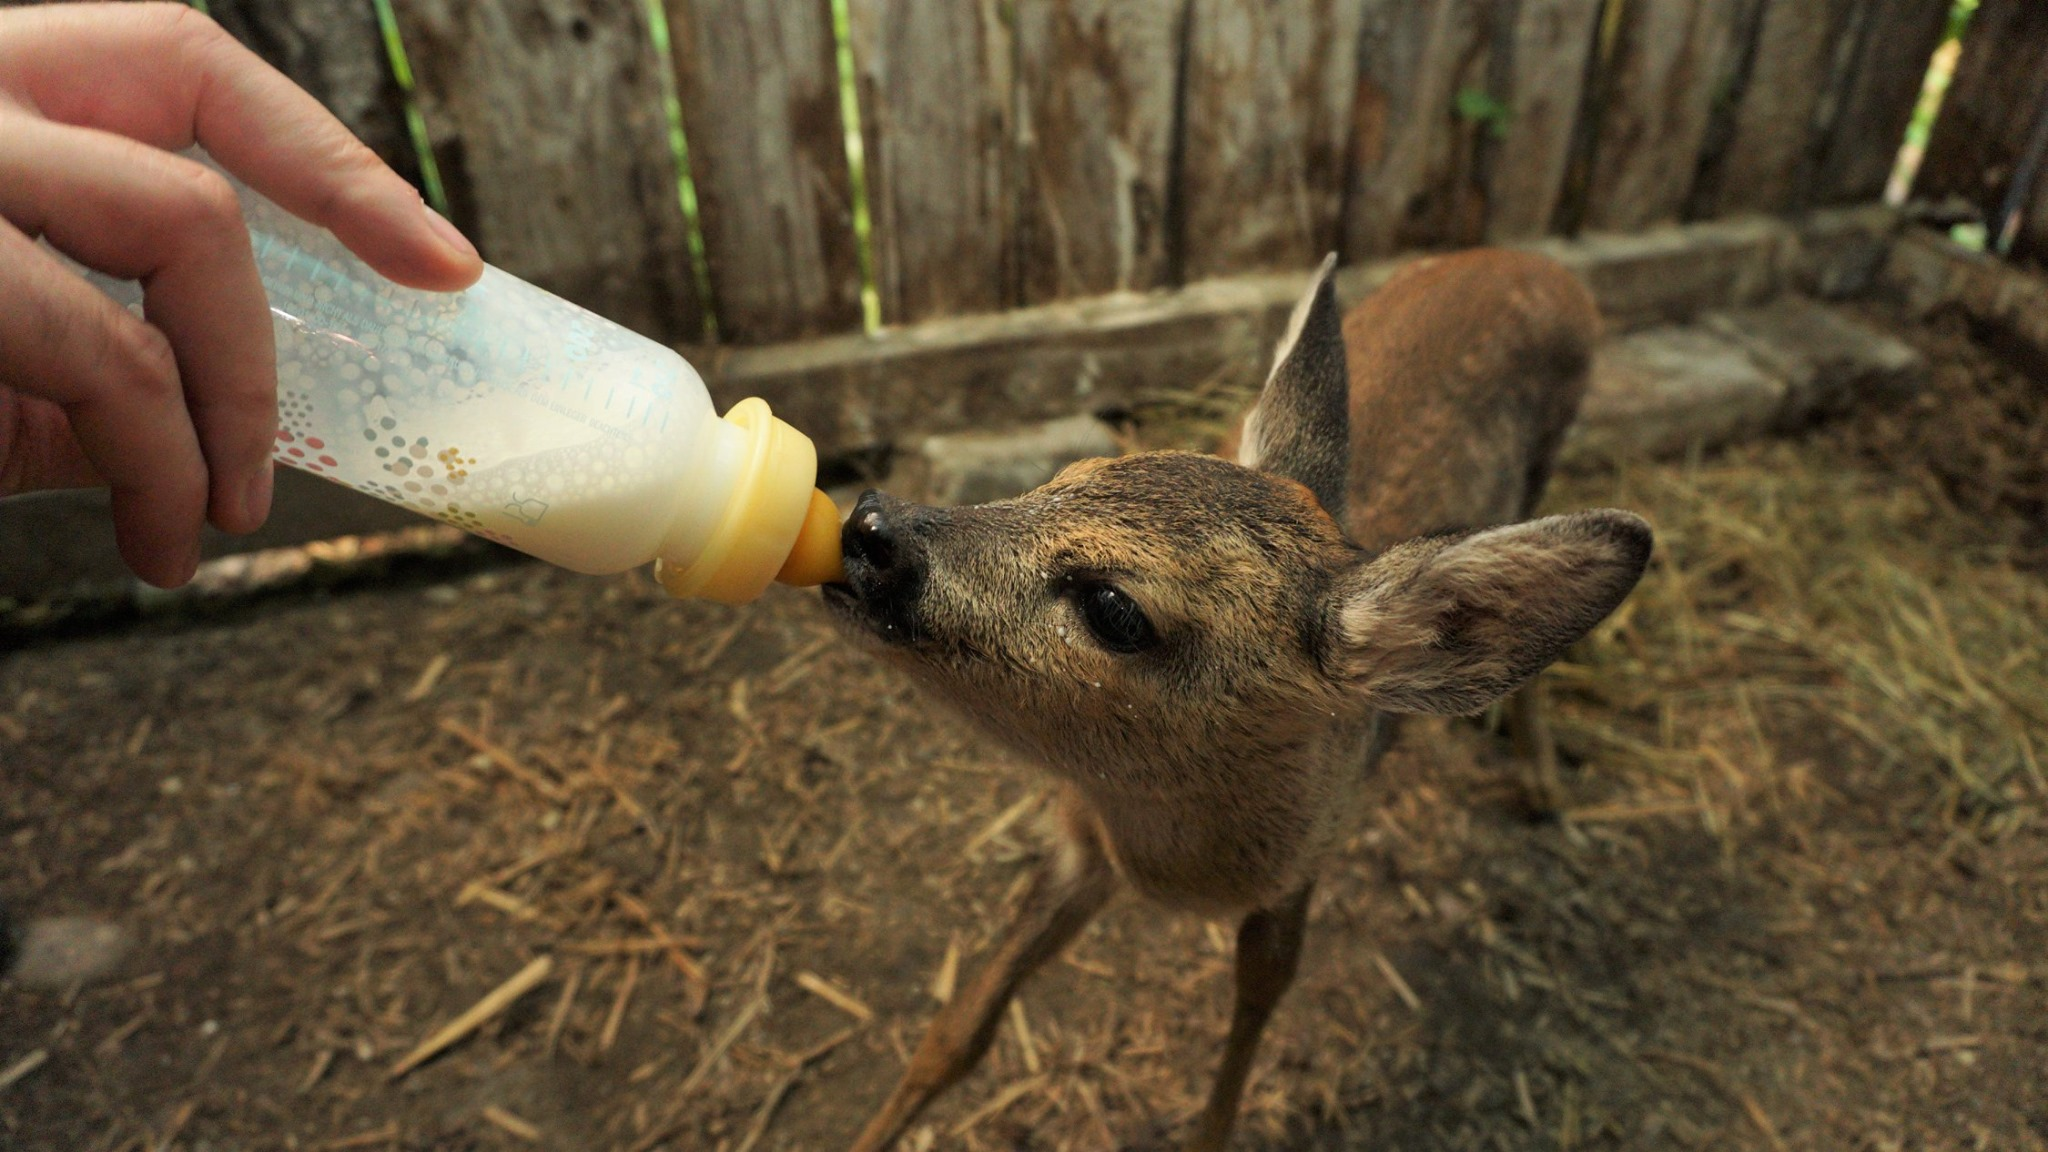 intre-prieteni-invatam-sa-salvam-animalele-salbatice-aflate-in-primejdie